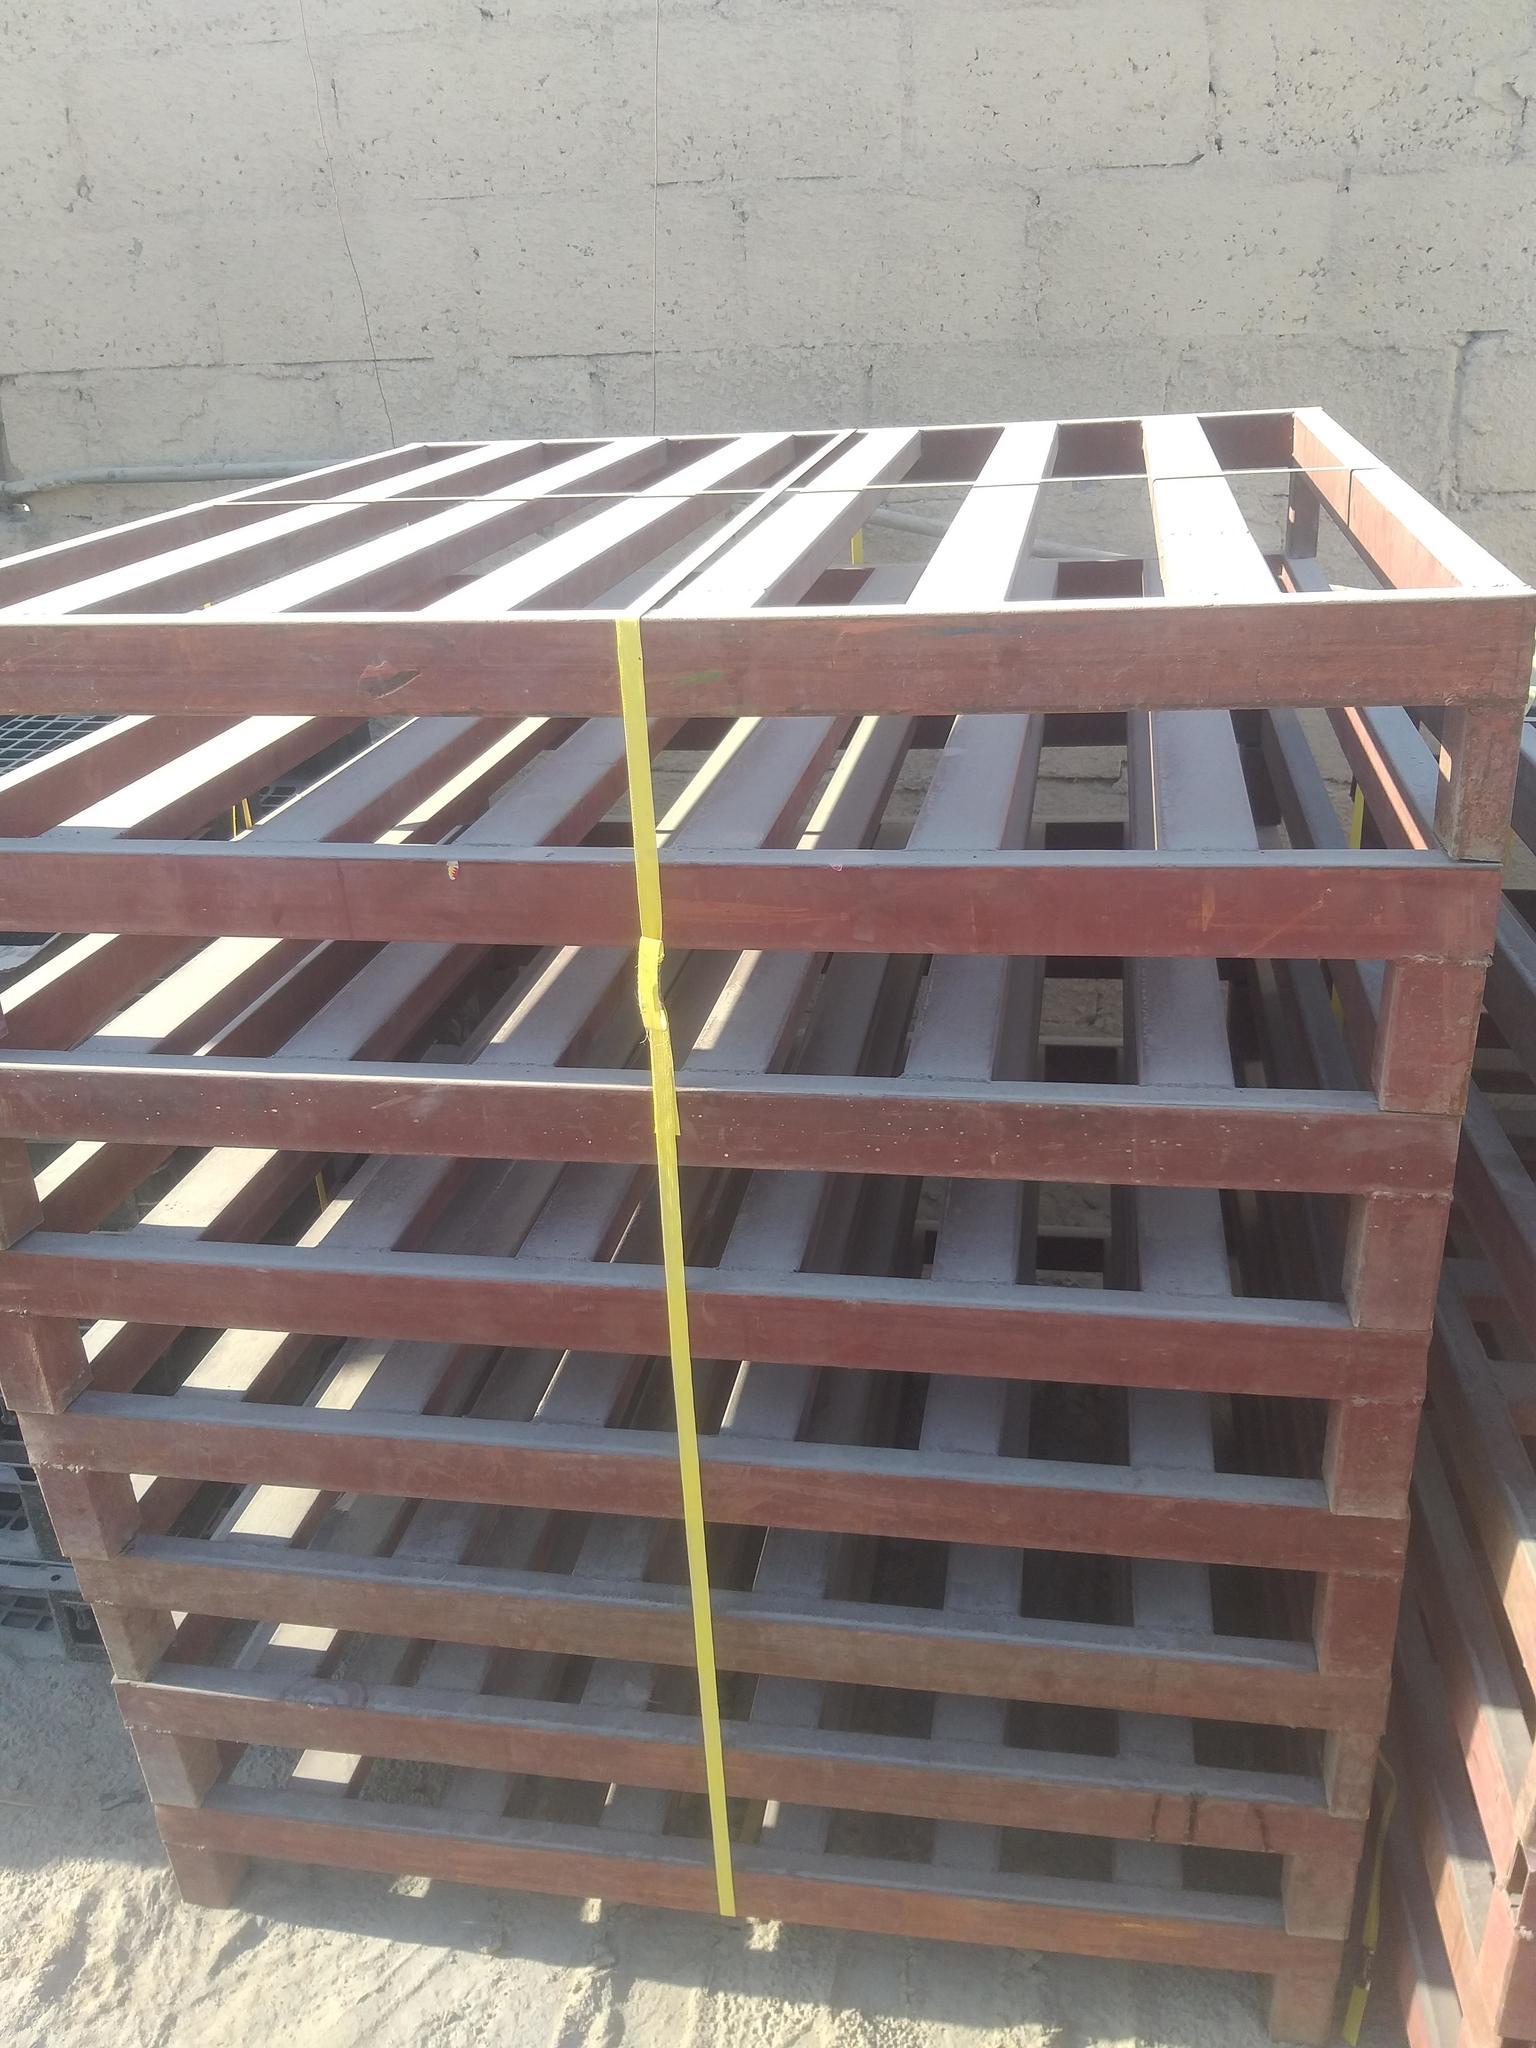 Steel Pallet for sale